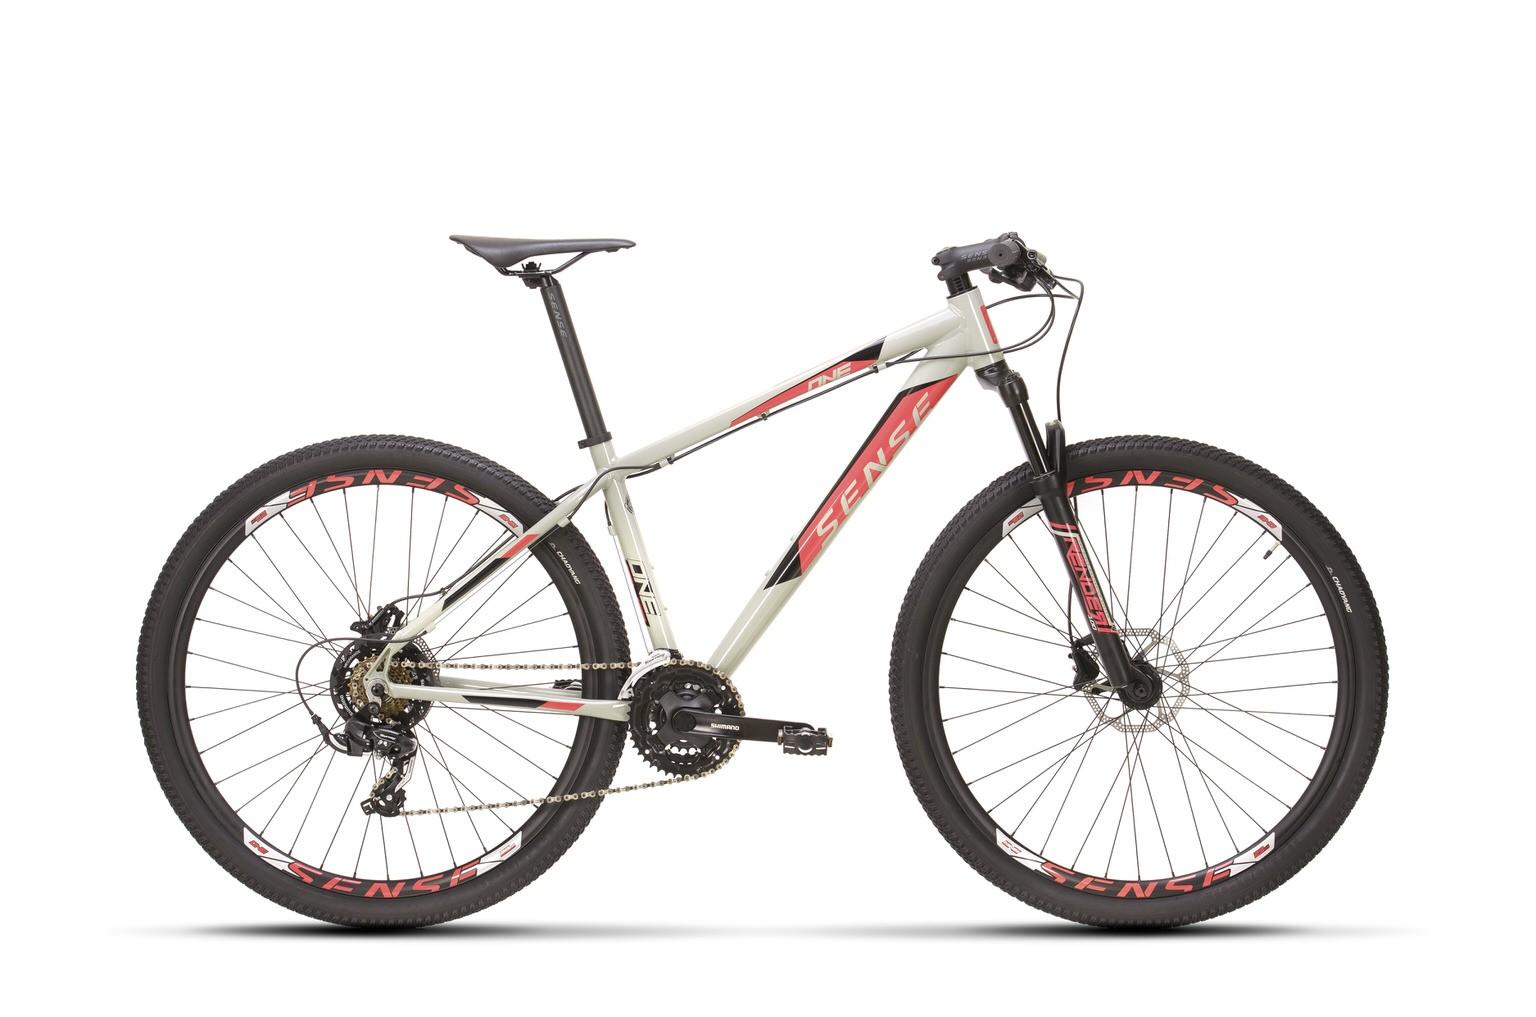 Bicicleta SENSE One 2021 - 21v Shimano Tourney - Freio a Disco Hidráulico - Cinza/Rosa